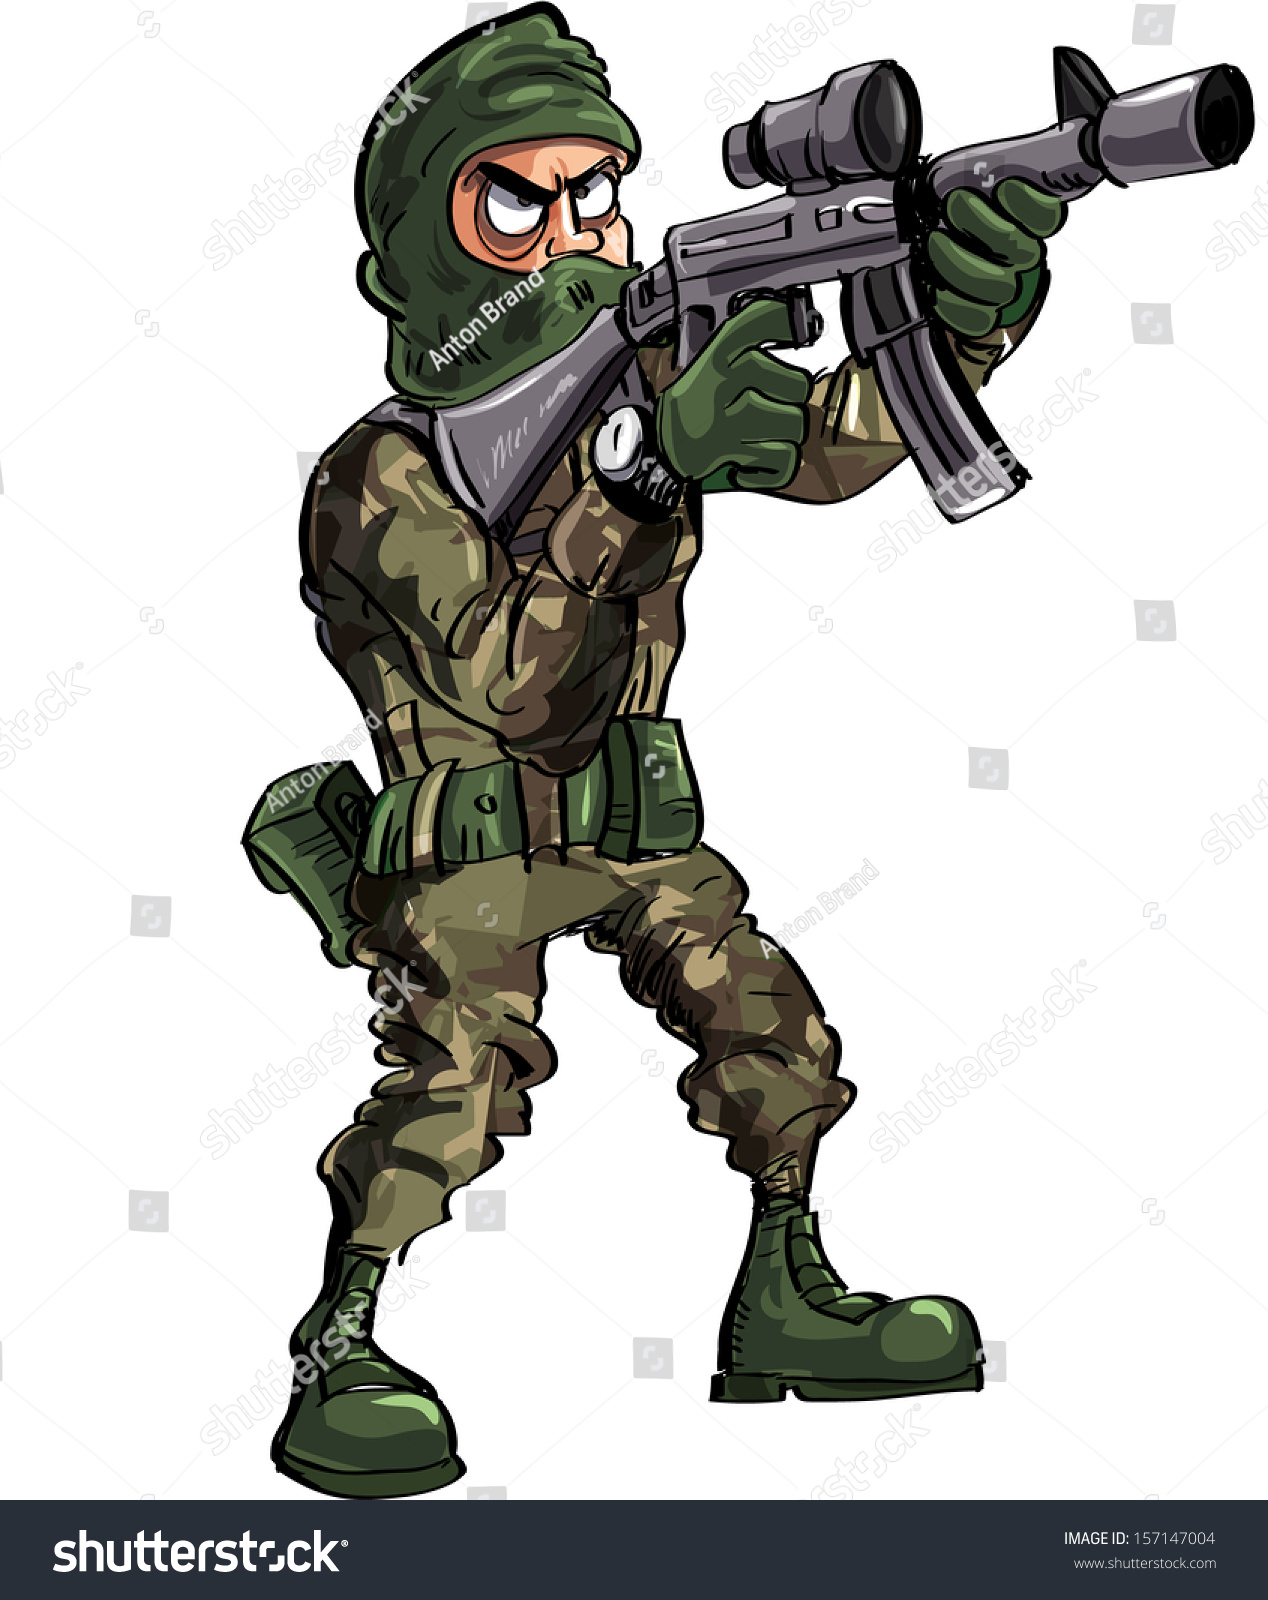 Cartoon Soldier With Gun And Balaclava. Isolated On White ... Soldier With Gun Cartoon